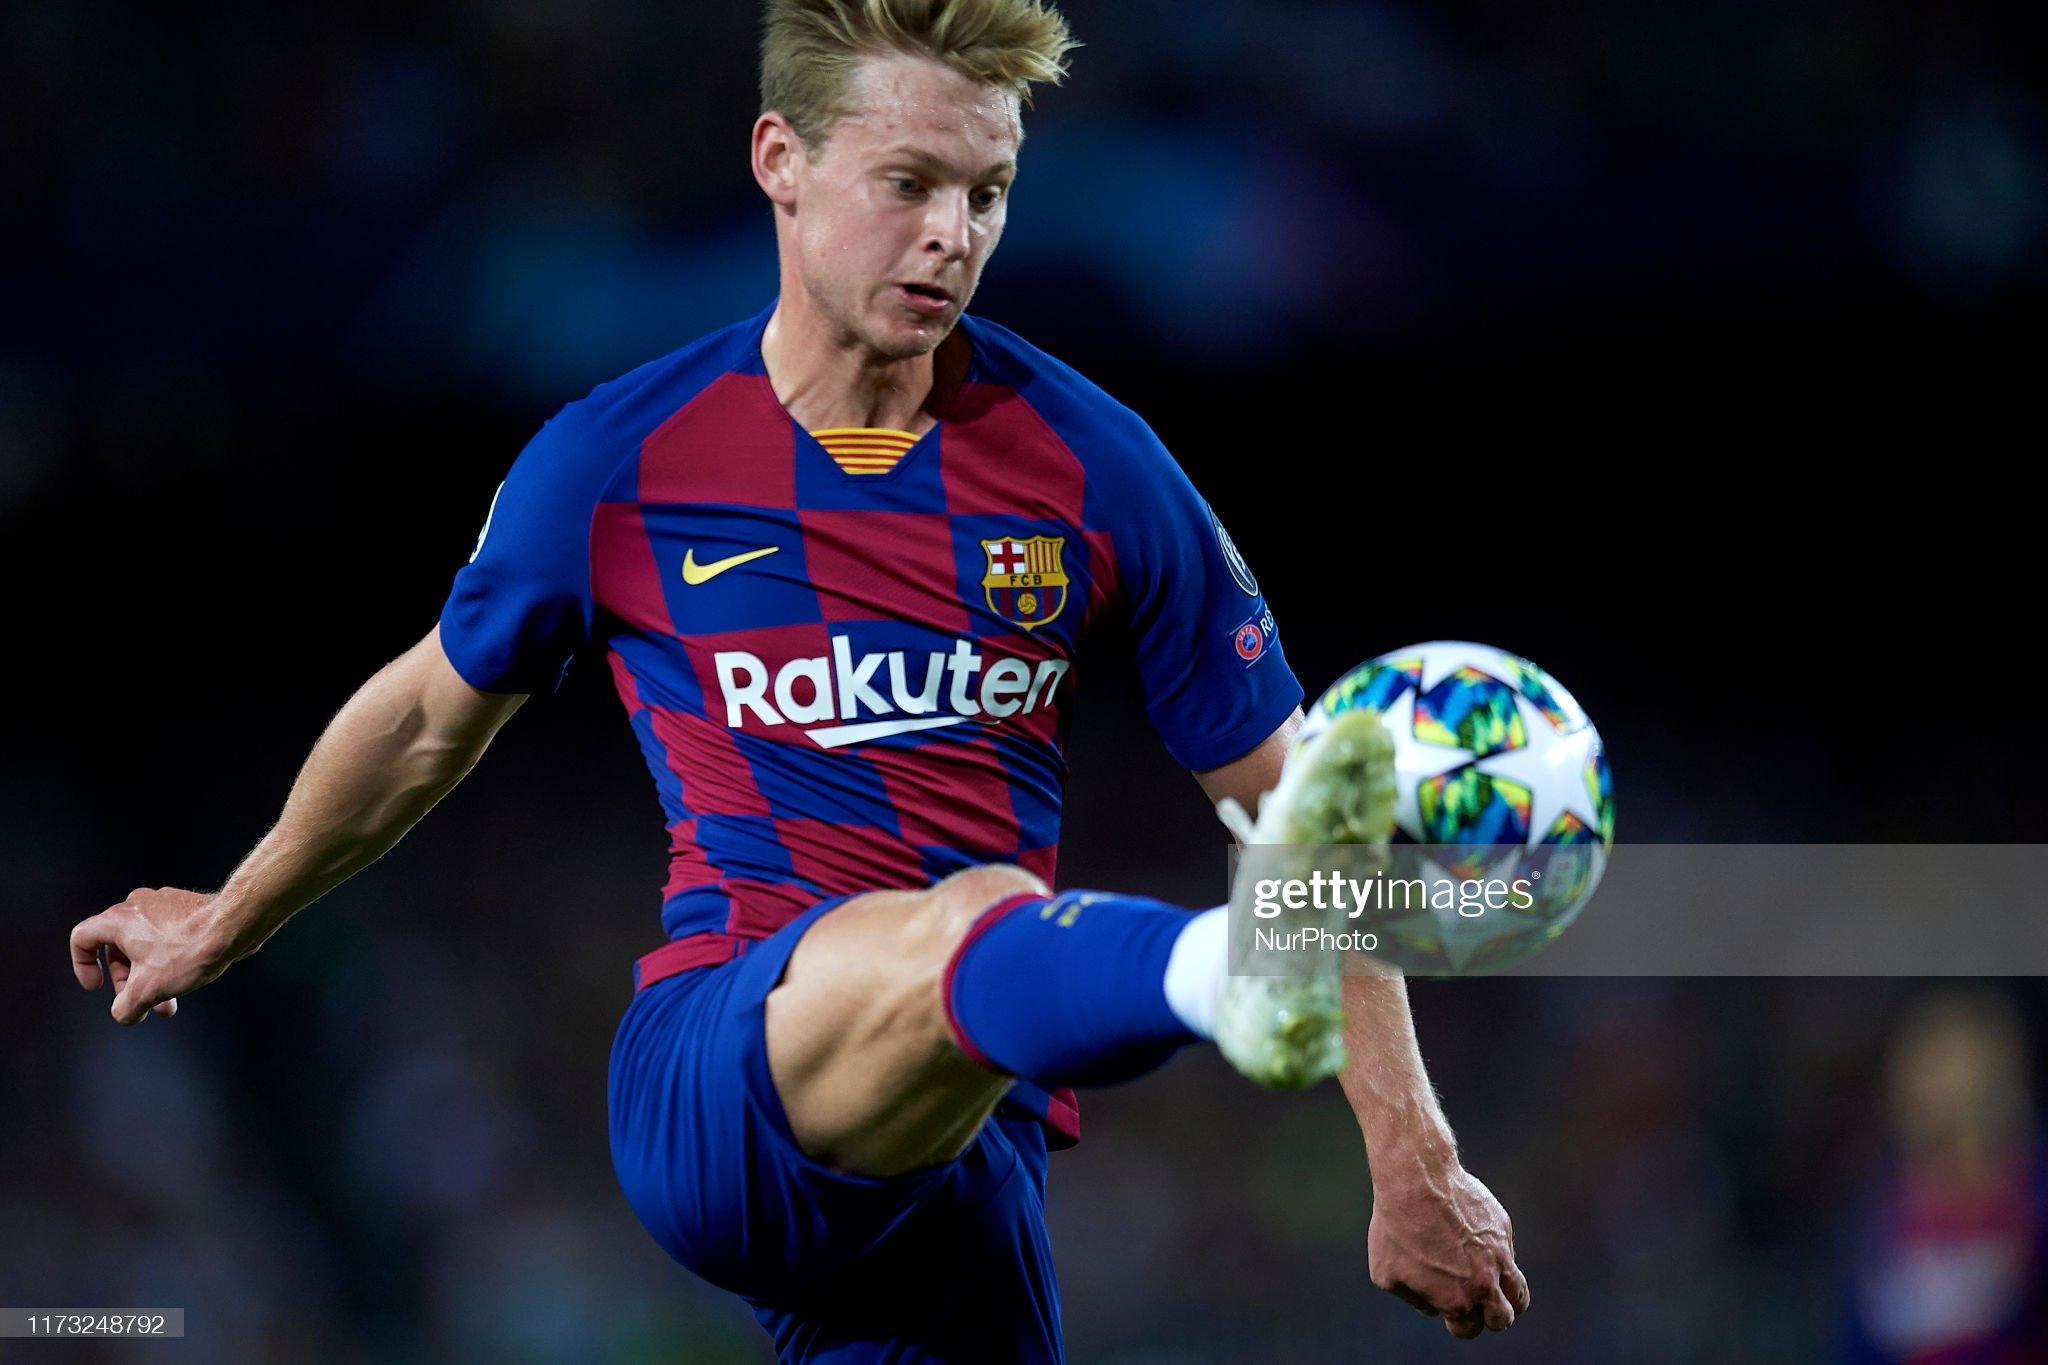 صور مباراة : برشلونة - إنتر 2-1 ( 02-10-2019 )  Frenkie-de-jong-of-barcelona-controls-the-ball-during-the-uefa-f-picture-id1173248792?s=2048x2048